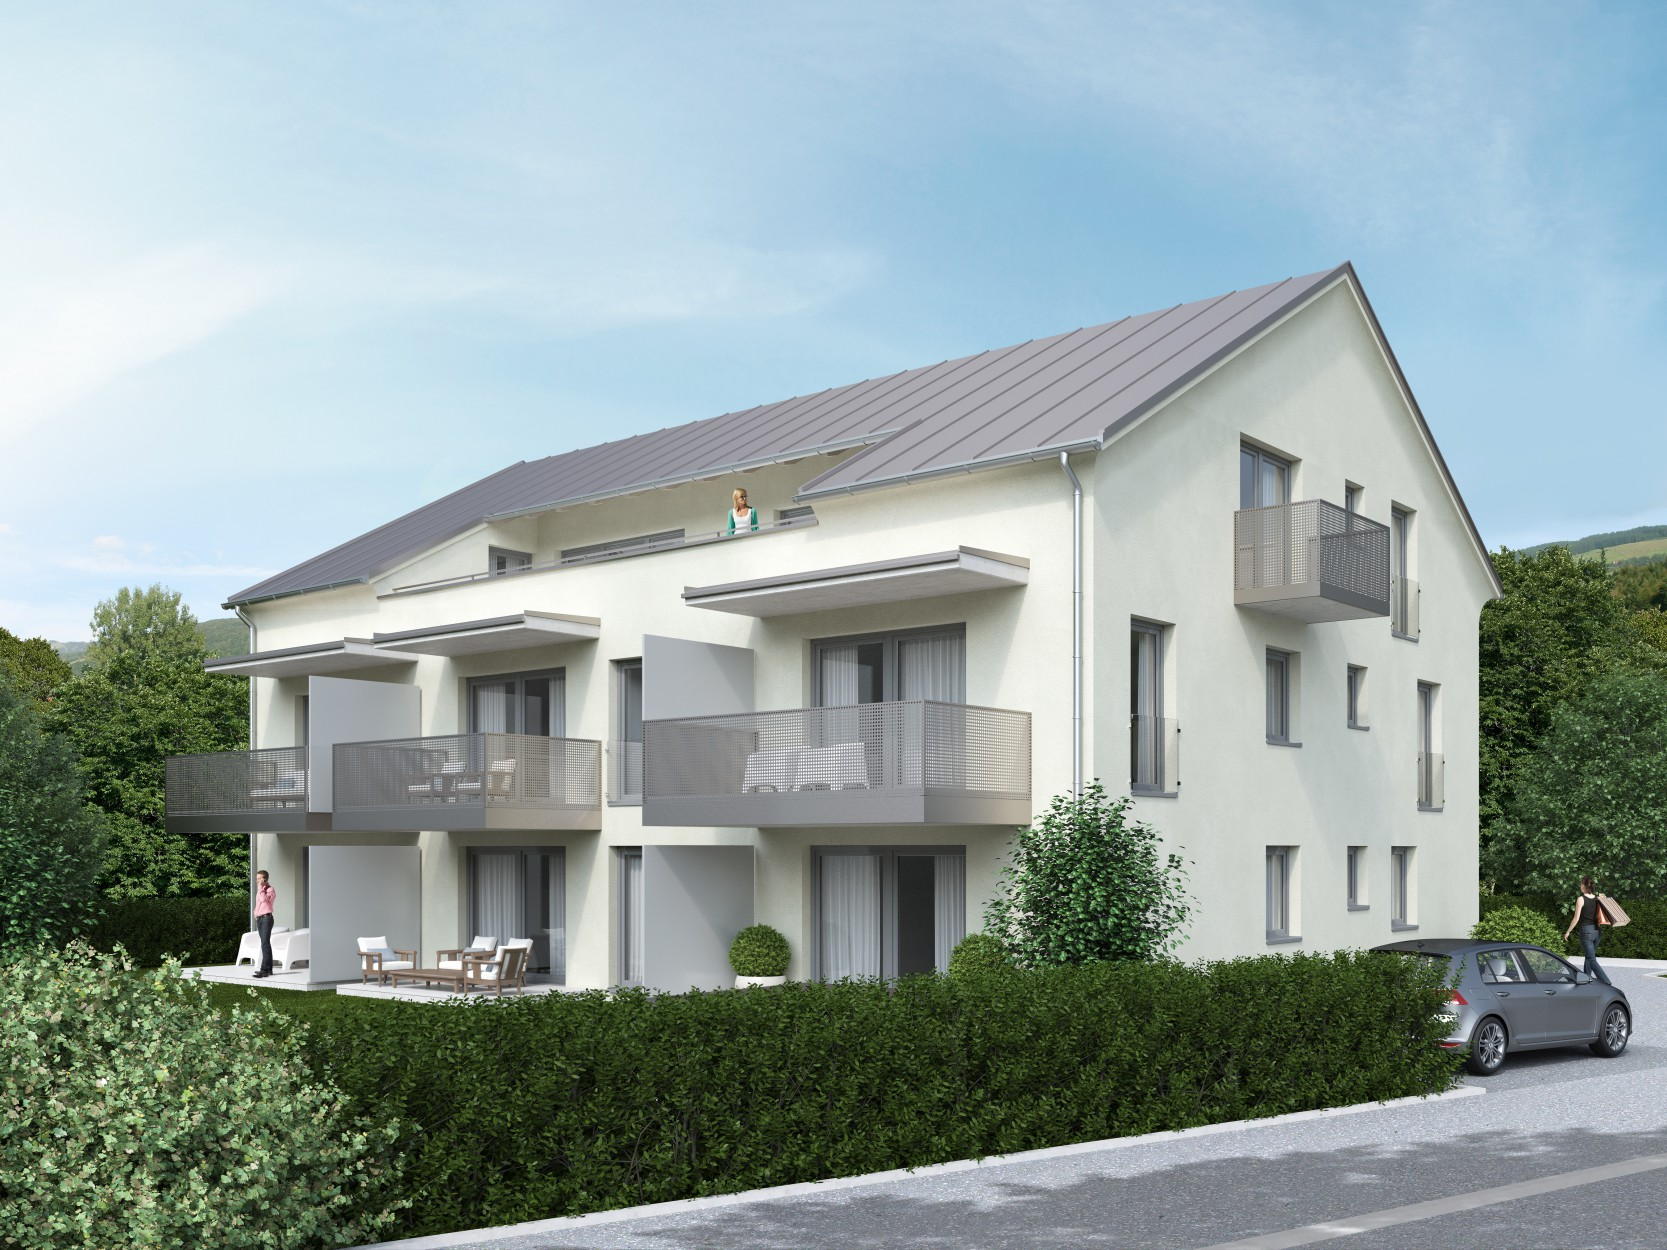 adnet 145 salzburg wohnbau. Black Bedroom Furniture Sets. Home Design Ideas